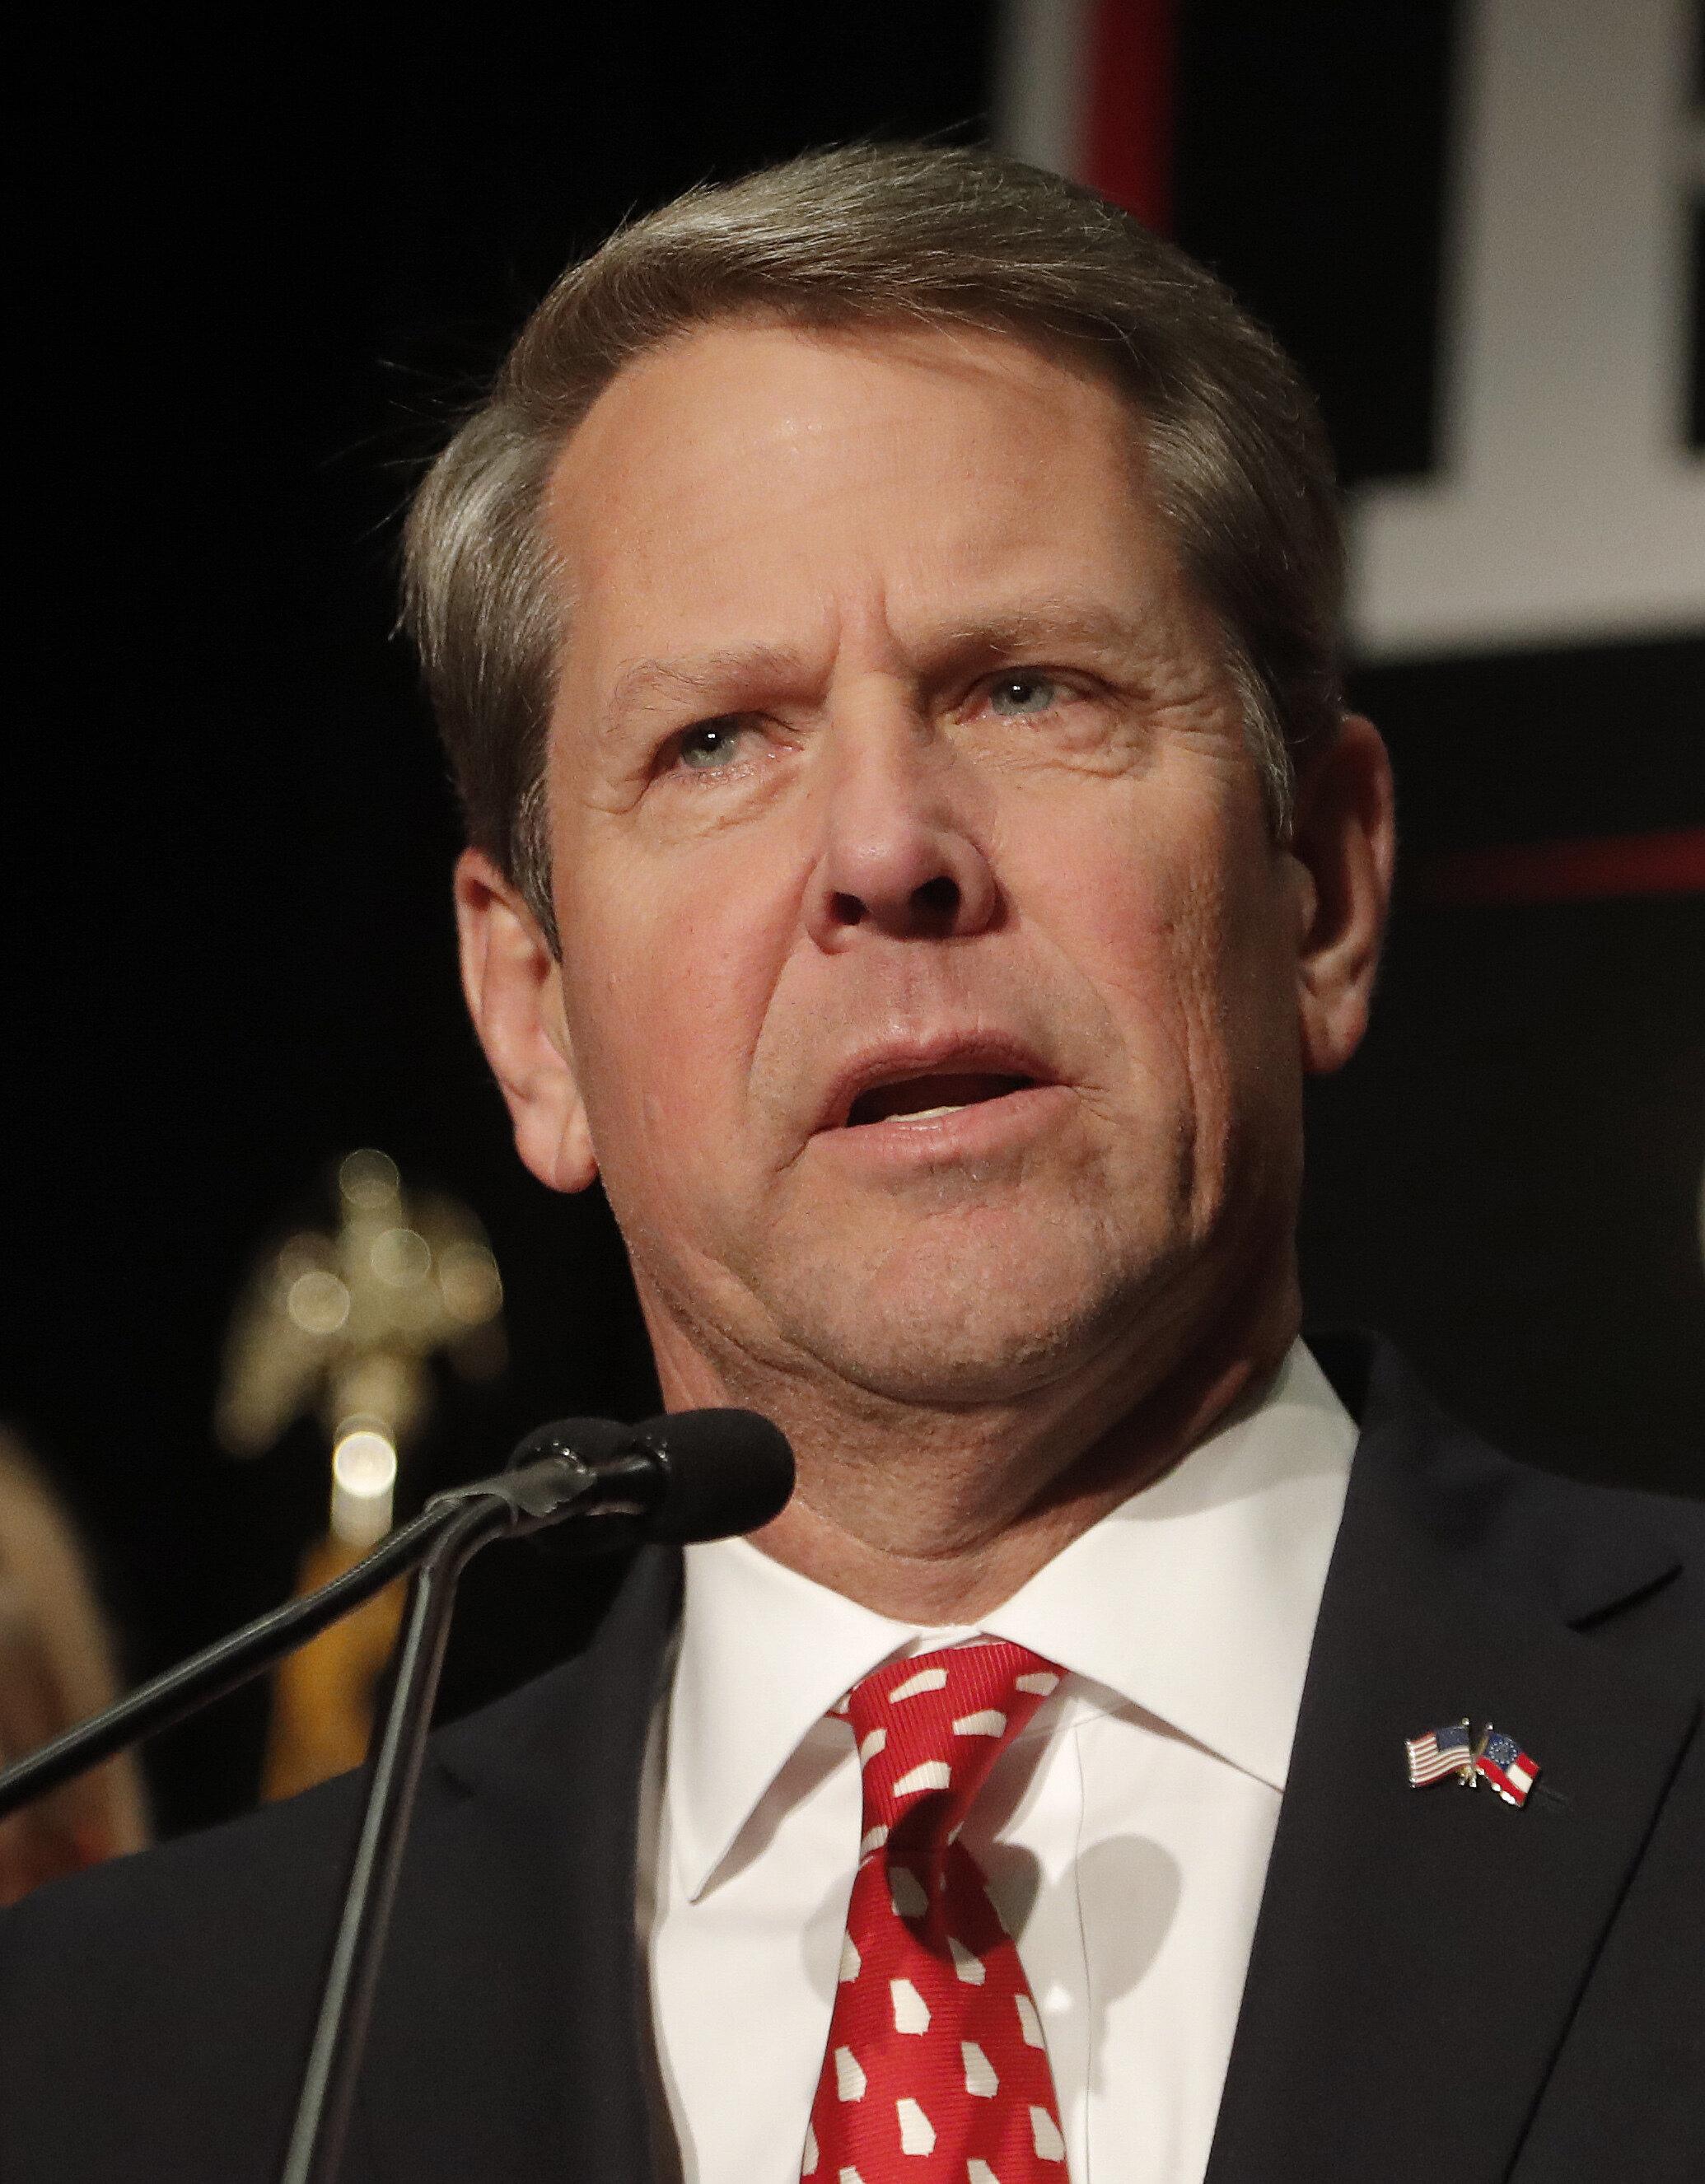 Georgia Republican gubernatorial candidate Brian Kemp speaks to supporters Wednesday, Nov. 7, 2018, in Athens, Ga. (AP Photo/John Bazemore)